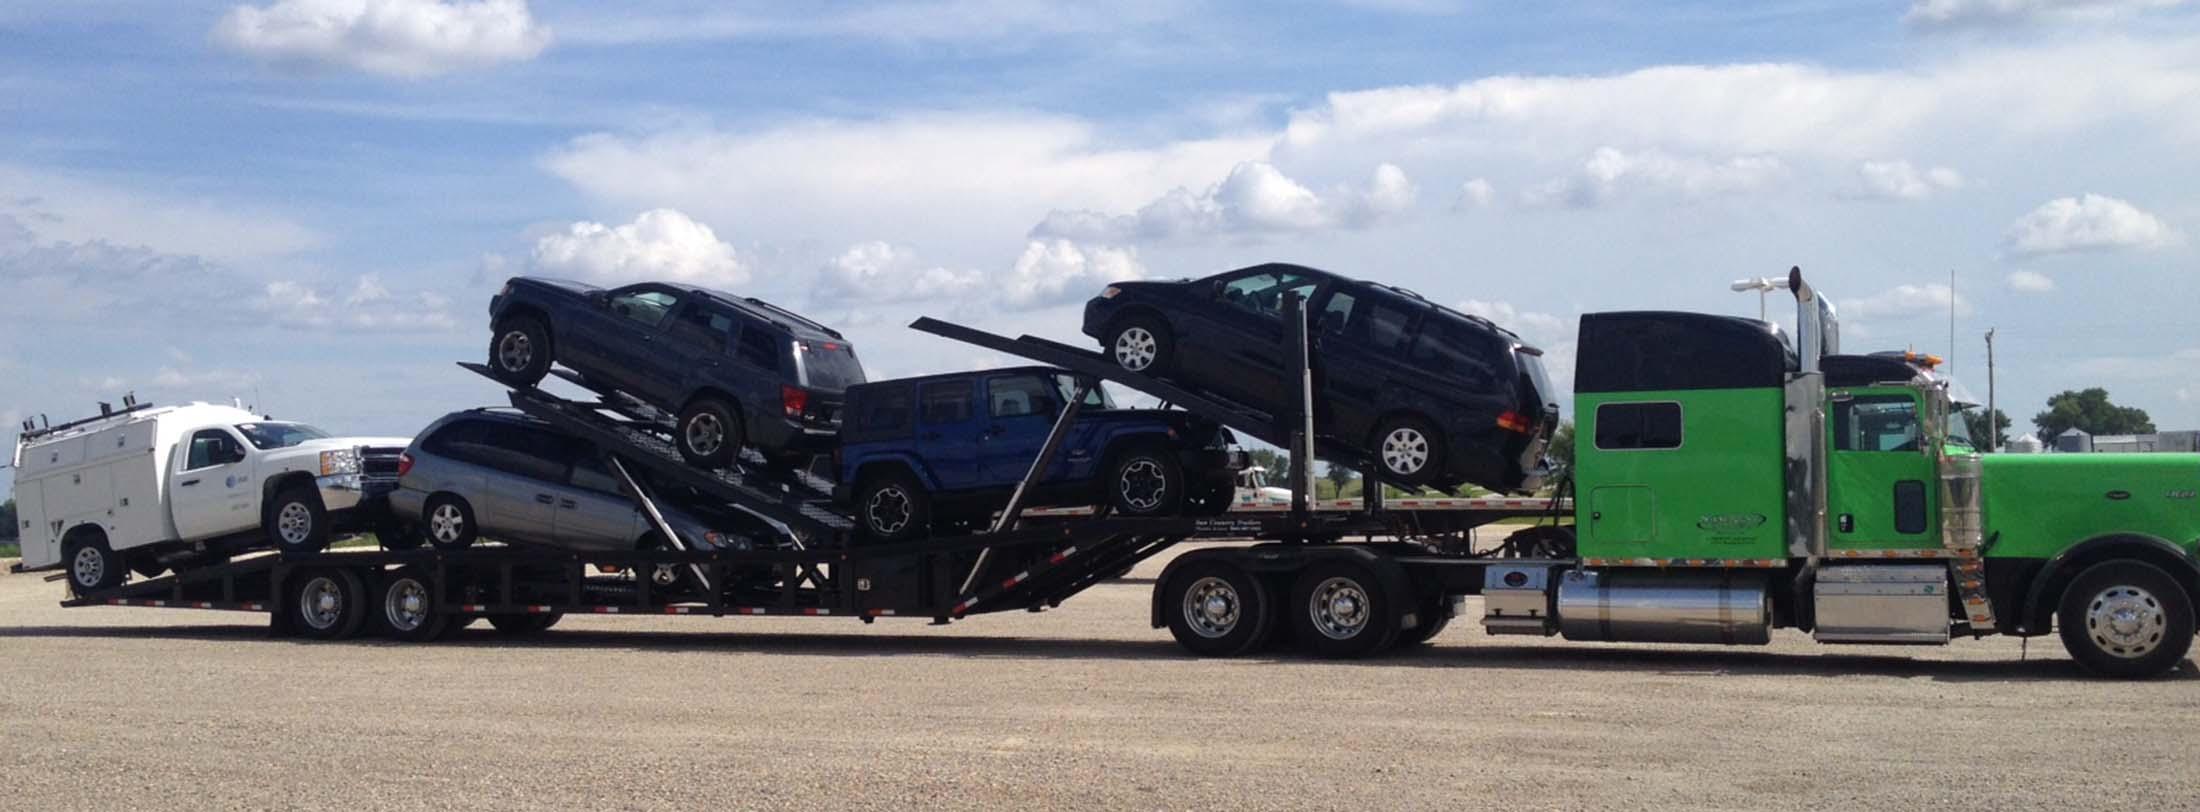 homepage-sliders-5-car-hauler